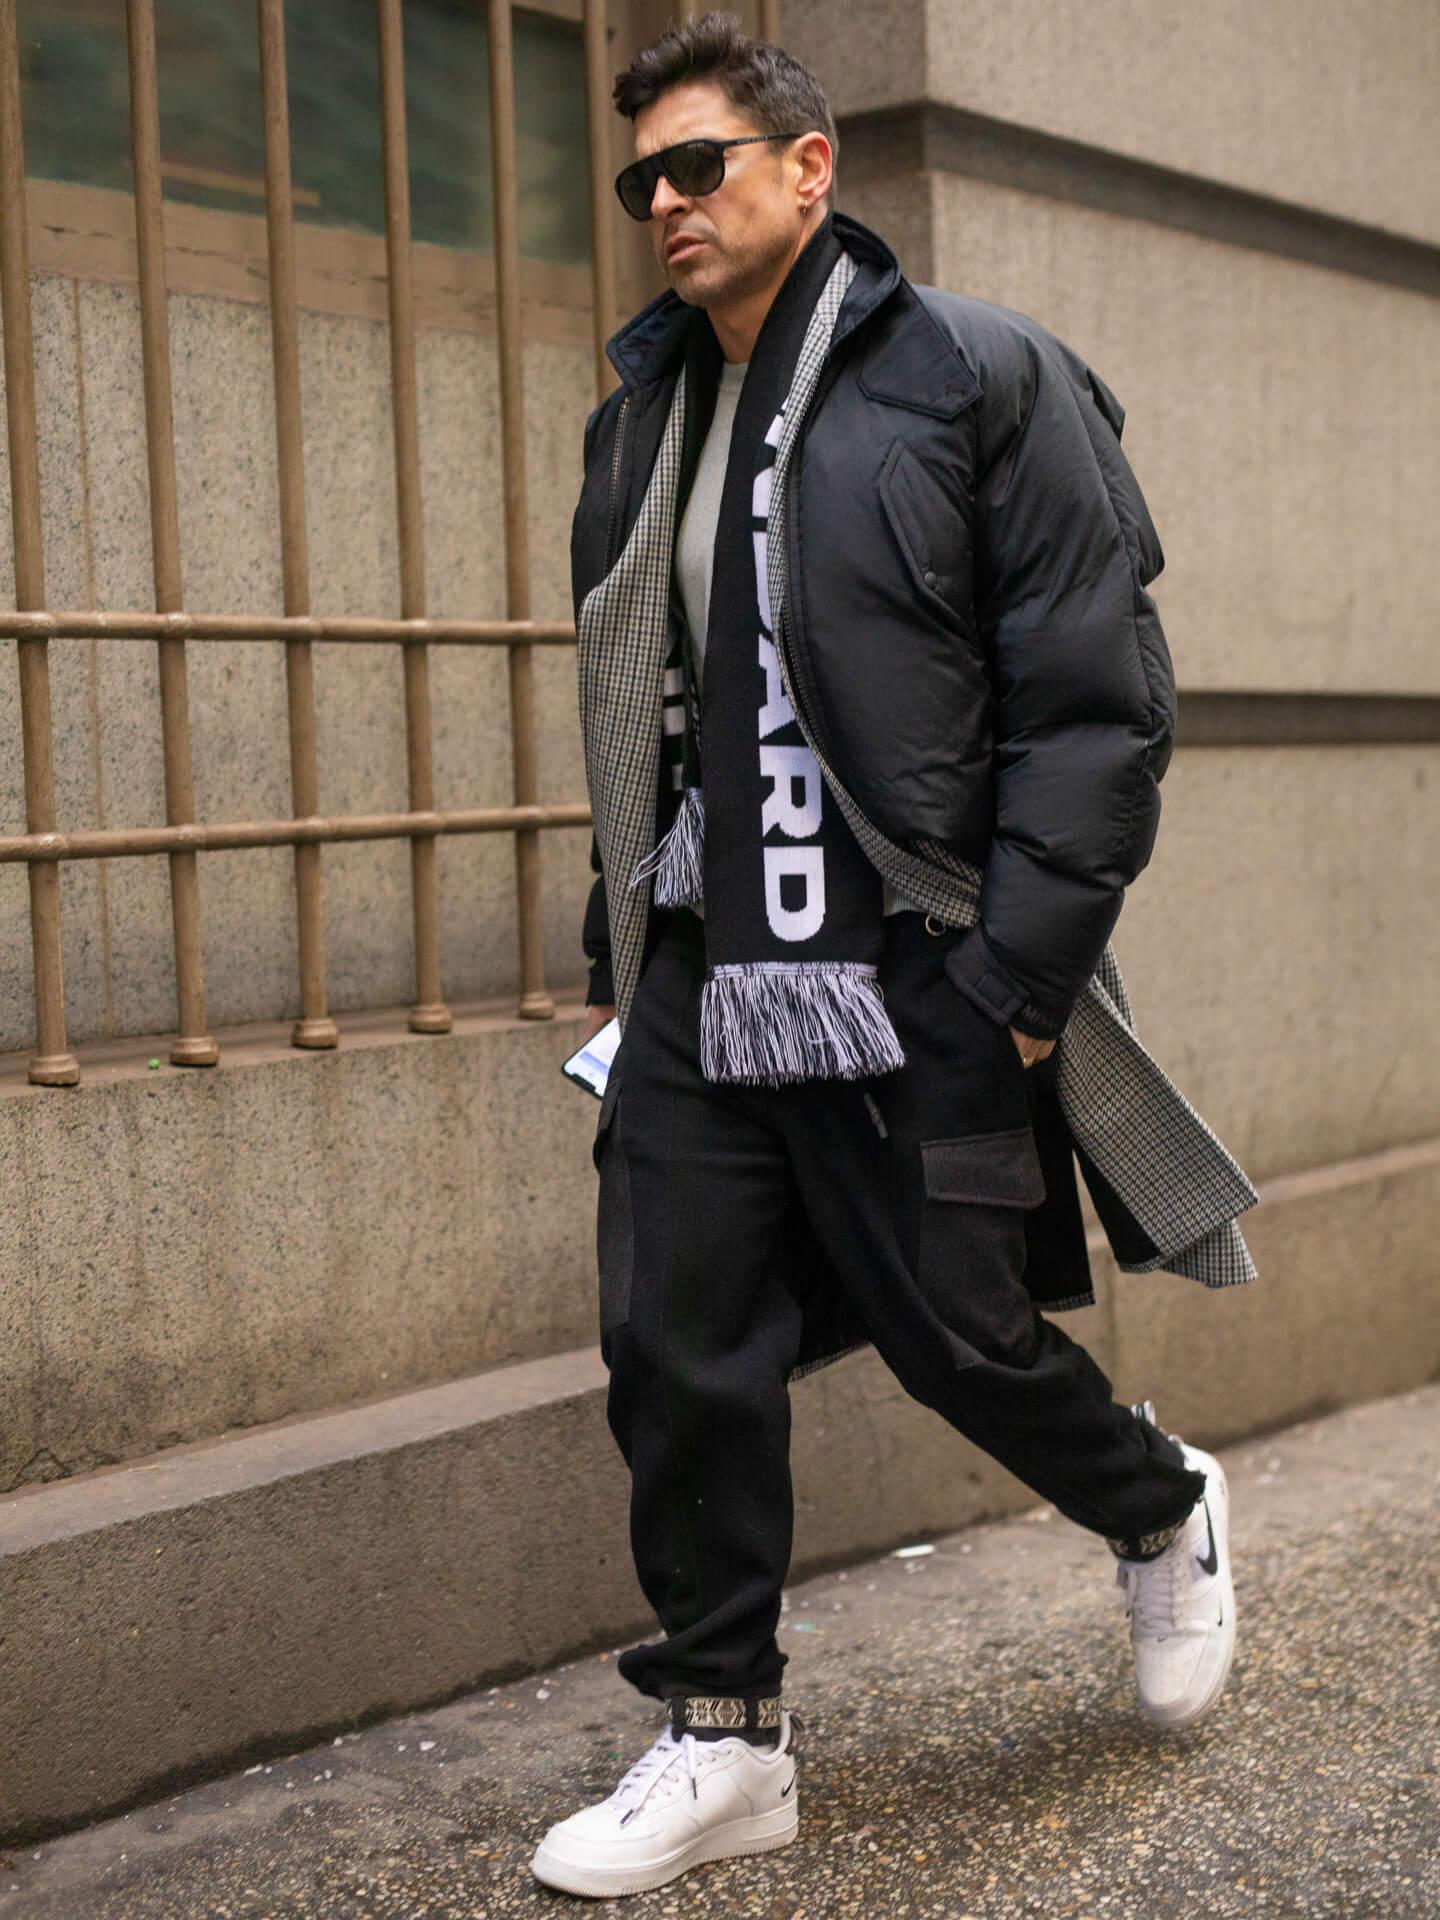 Steppjacke Männer Alex Badia Shoe Fashion